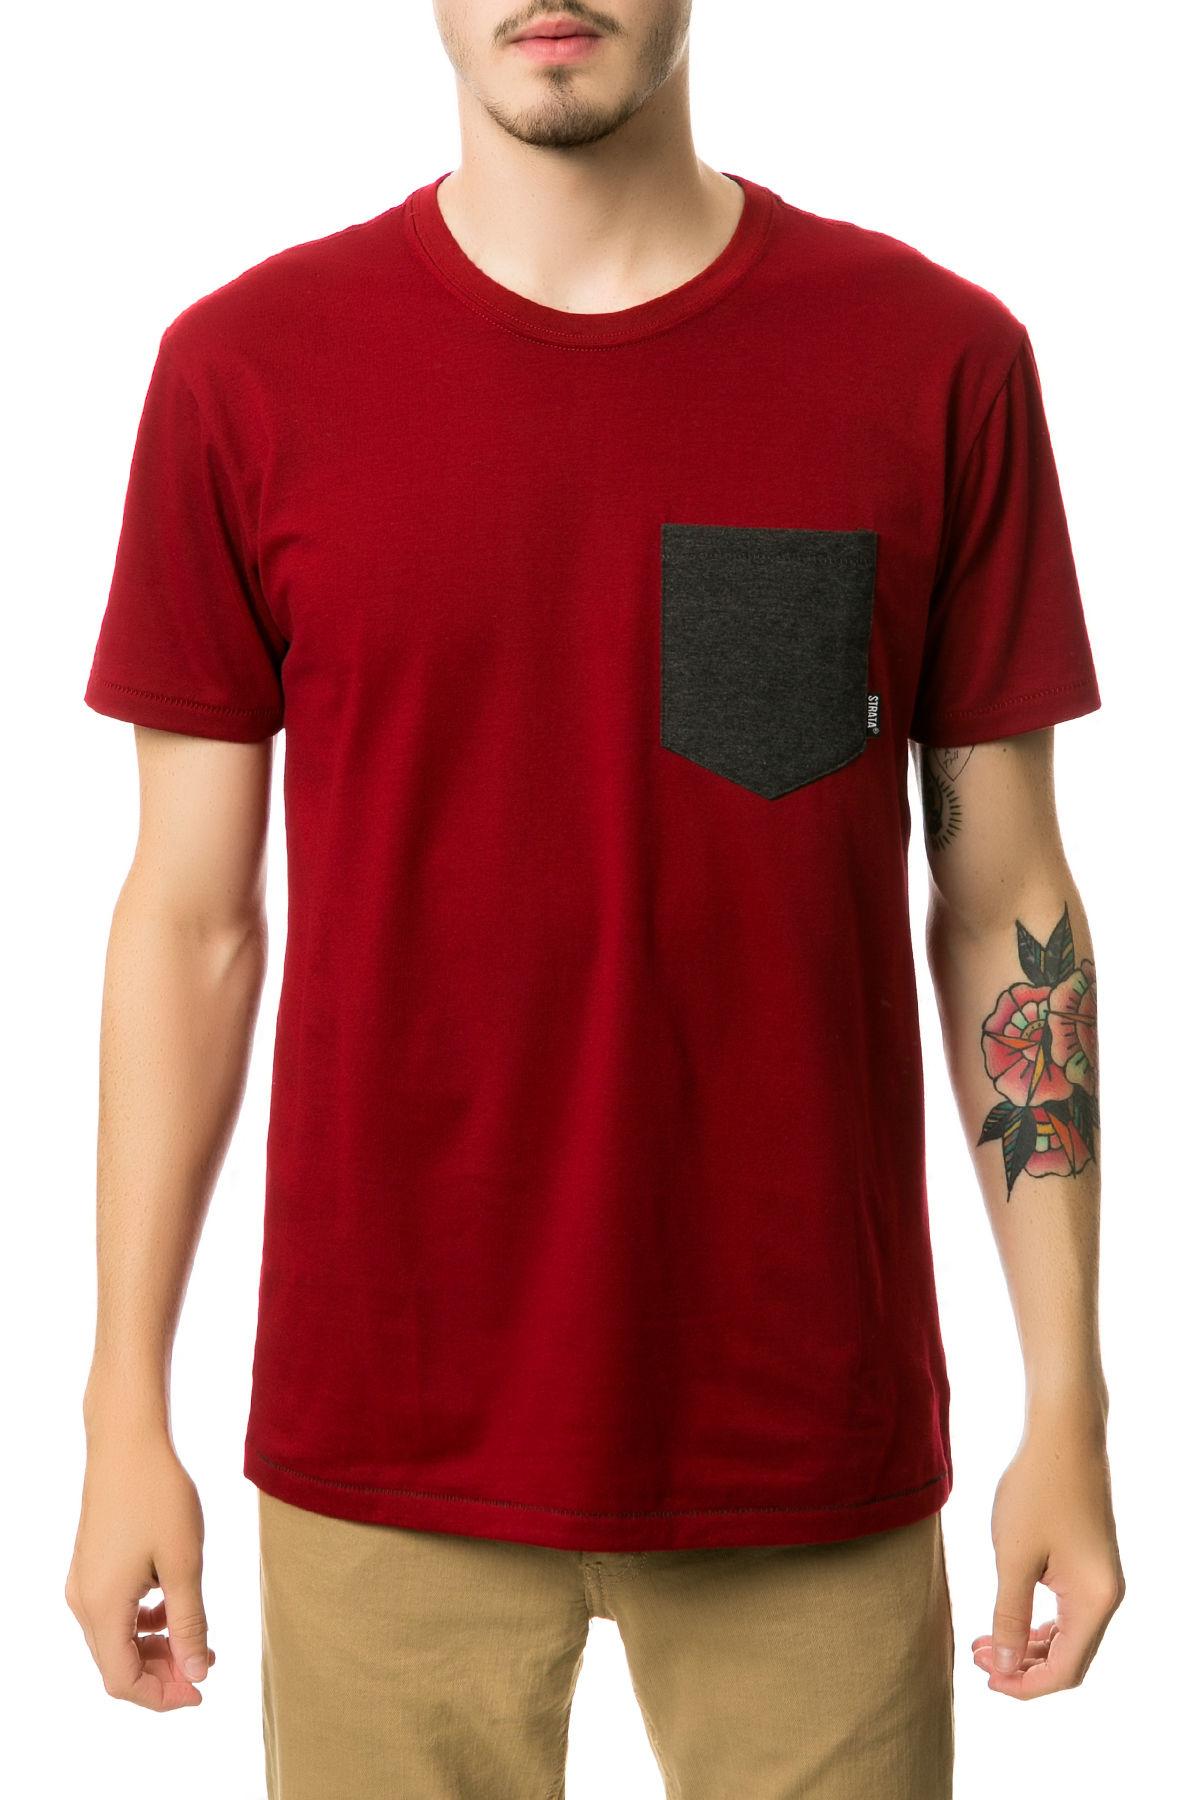 strata clothing maroon pocket premium maroon in